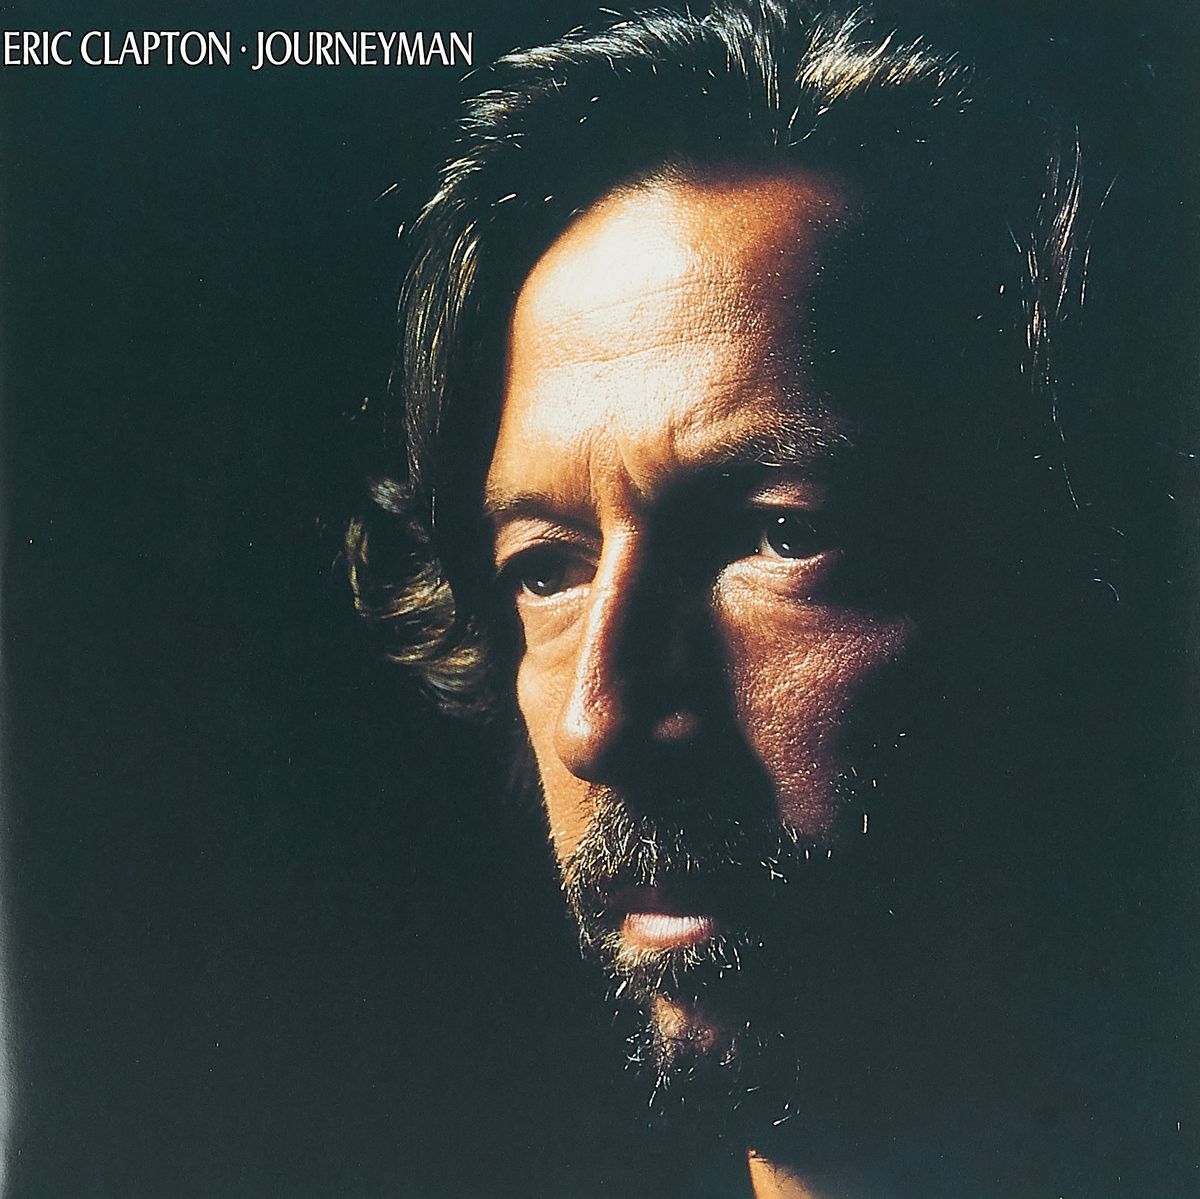 Эрик Клэптон Eric Clapton. Journeyman (2 LP) эрик клэптон eric clapton slowhand 35th anniversary edition lp